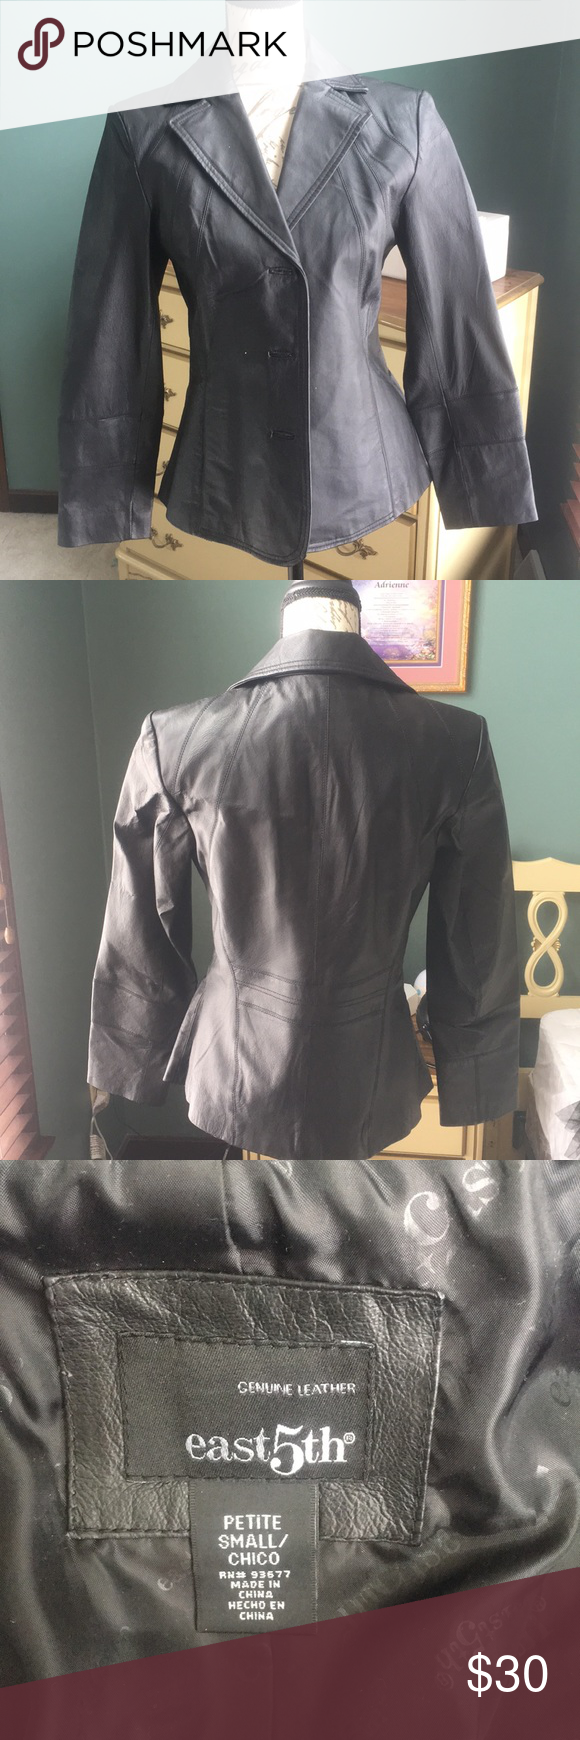 Black leather jacket Form fitting black leather jacket